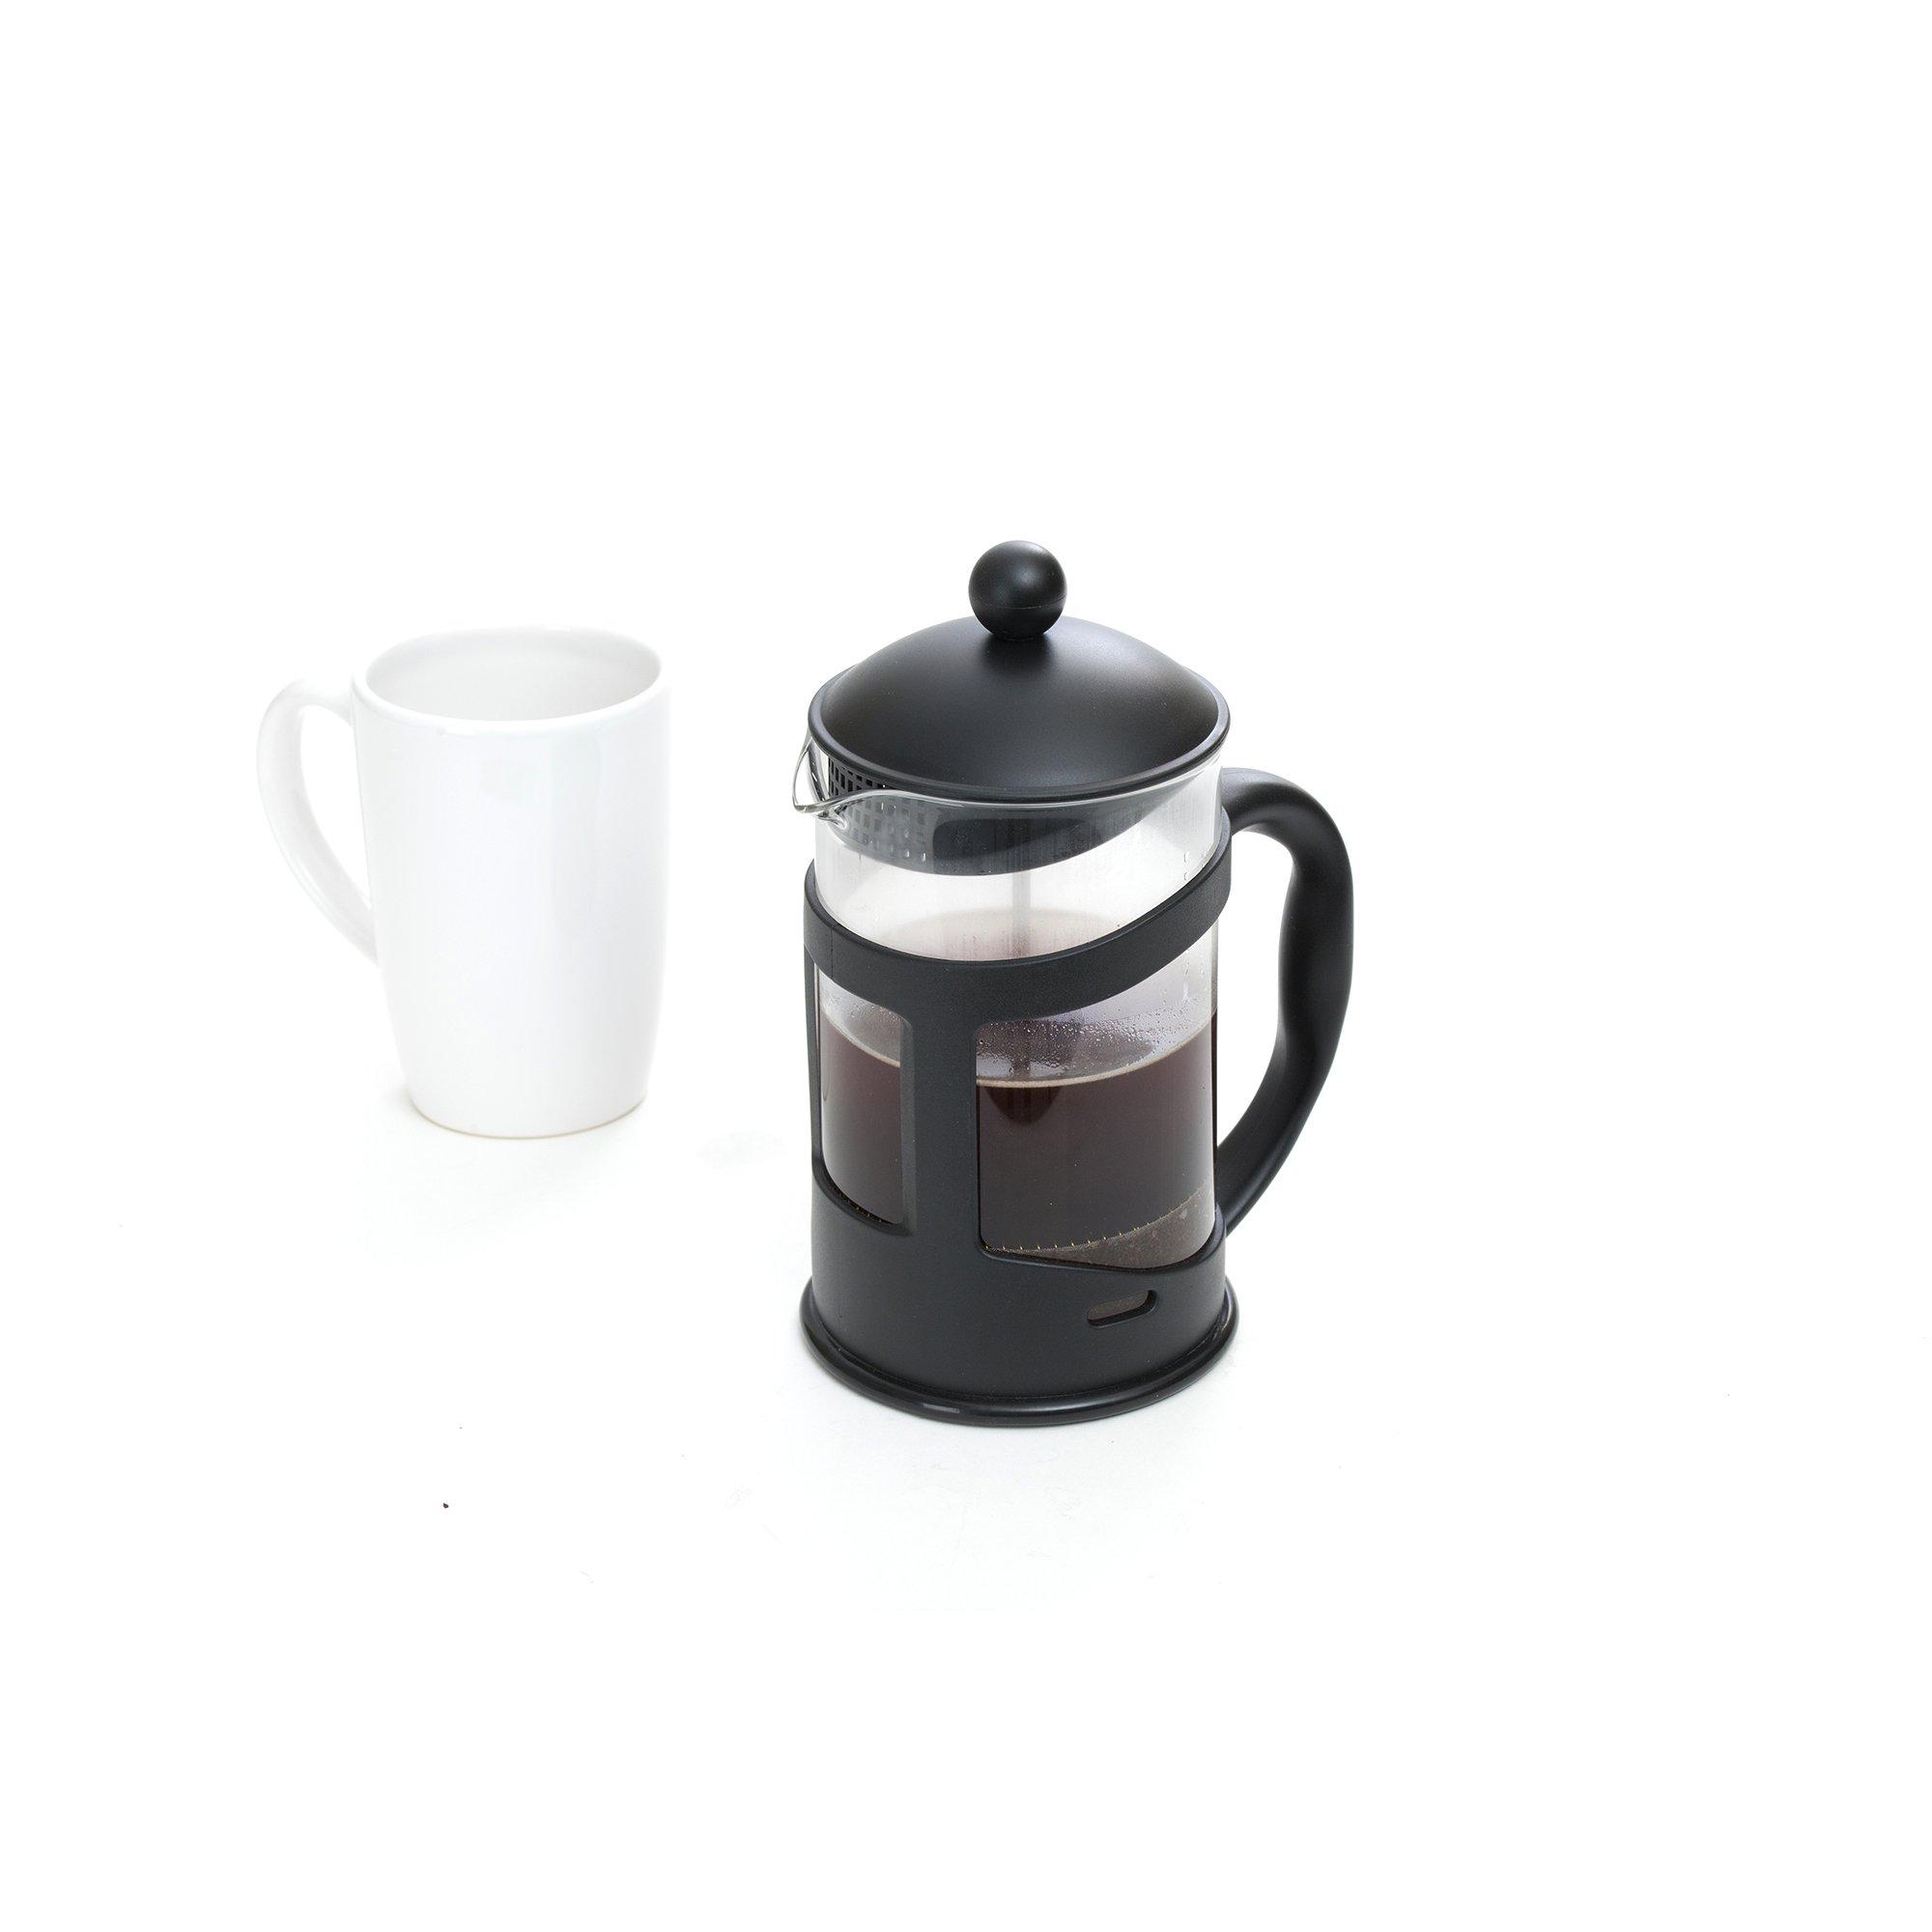 Mind Reader French Press Coffee & Tea Maker 27 oz, Glass by Mind Reader (Image #3)